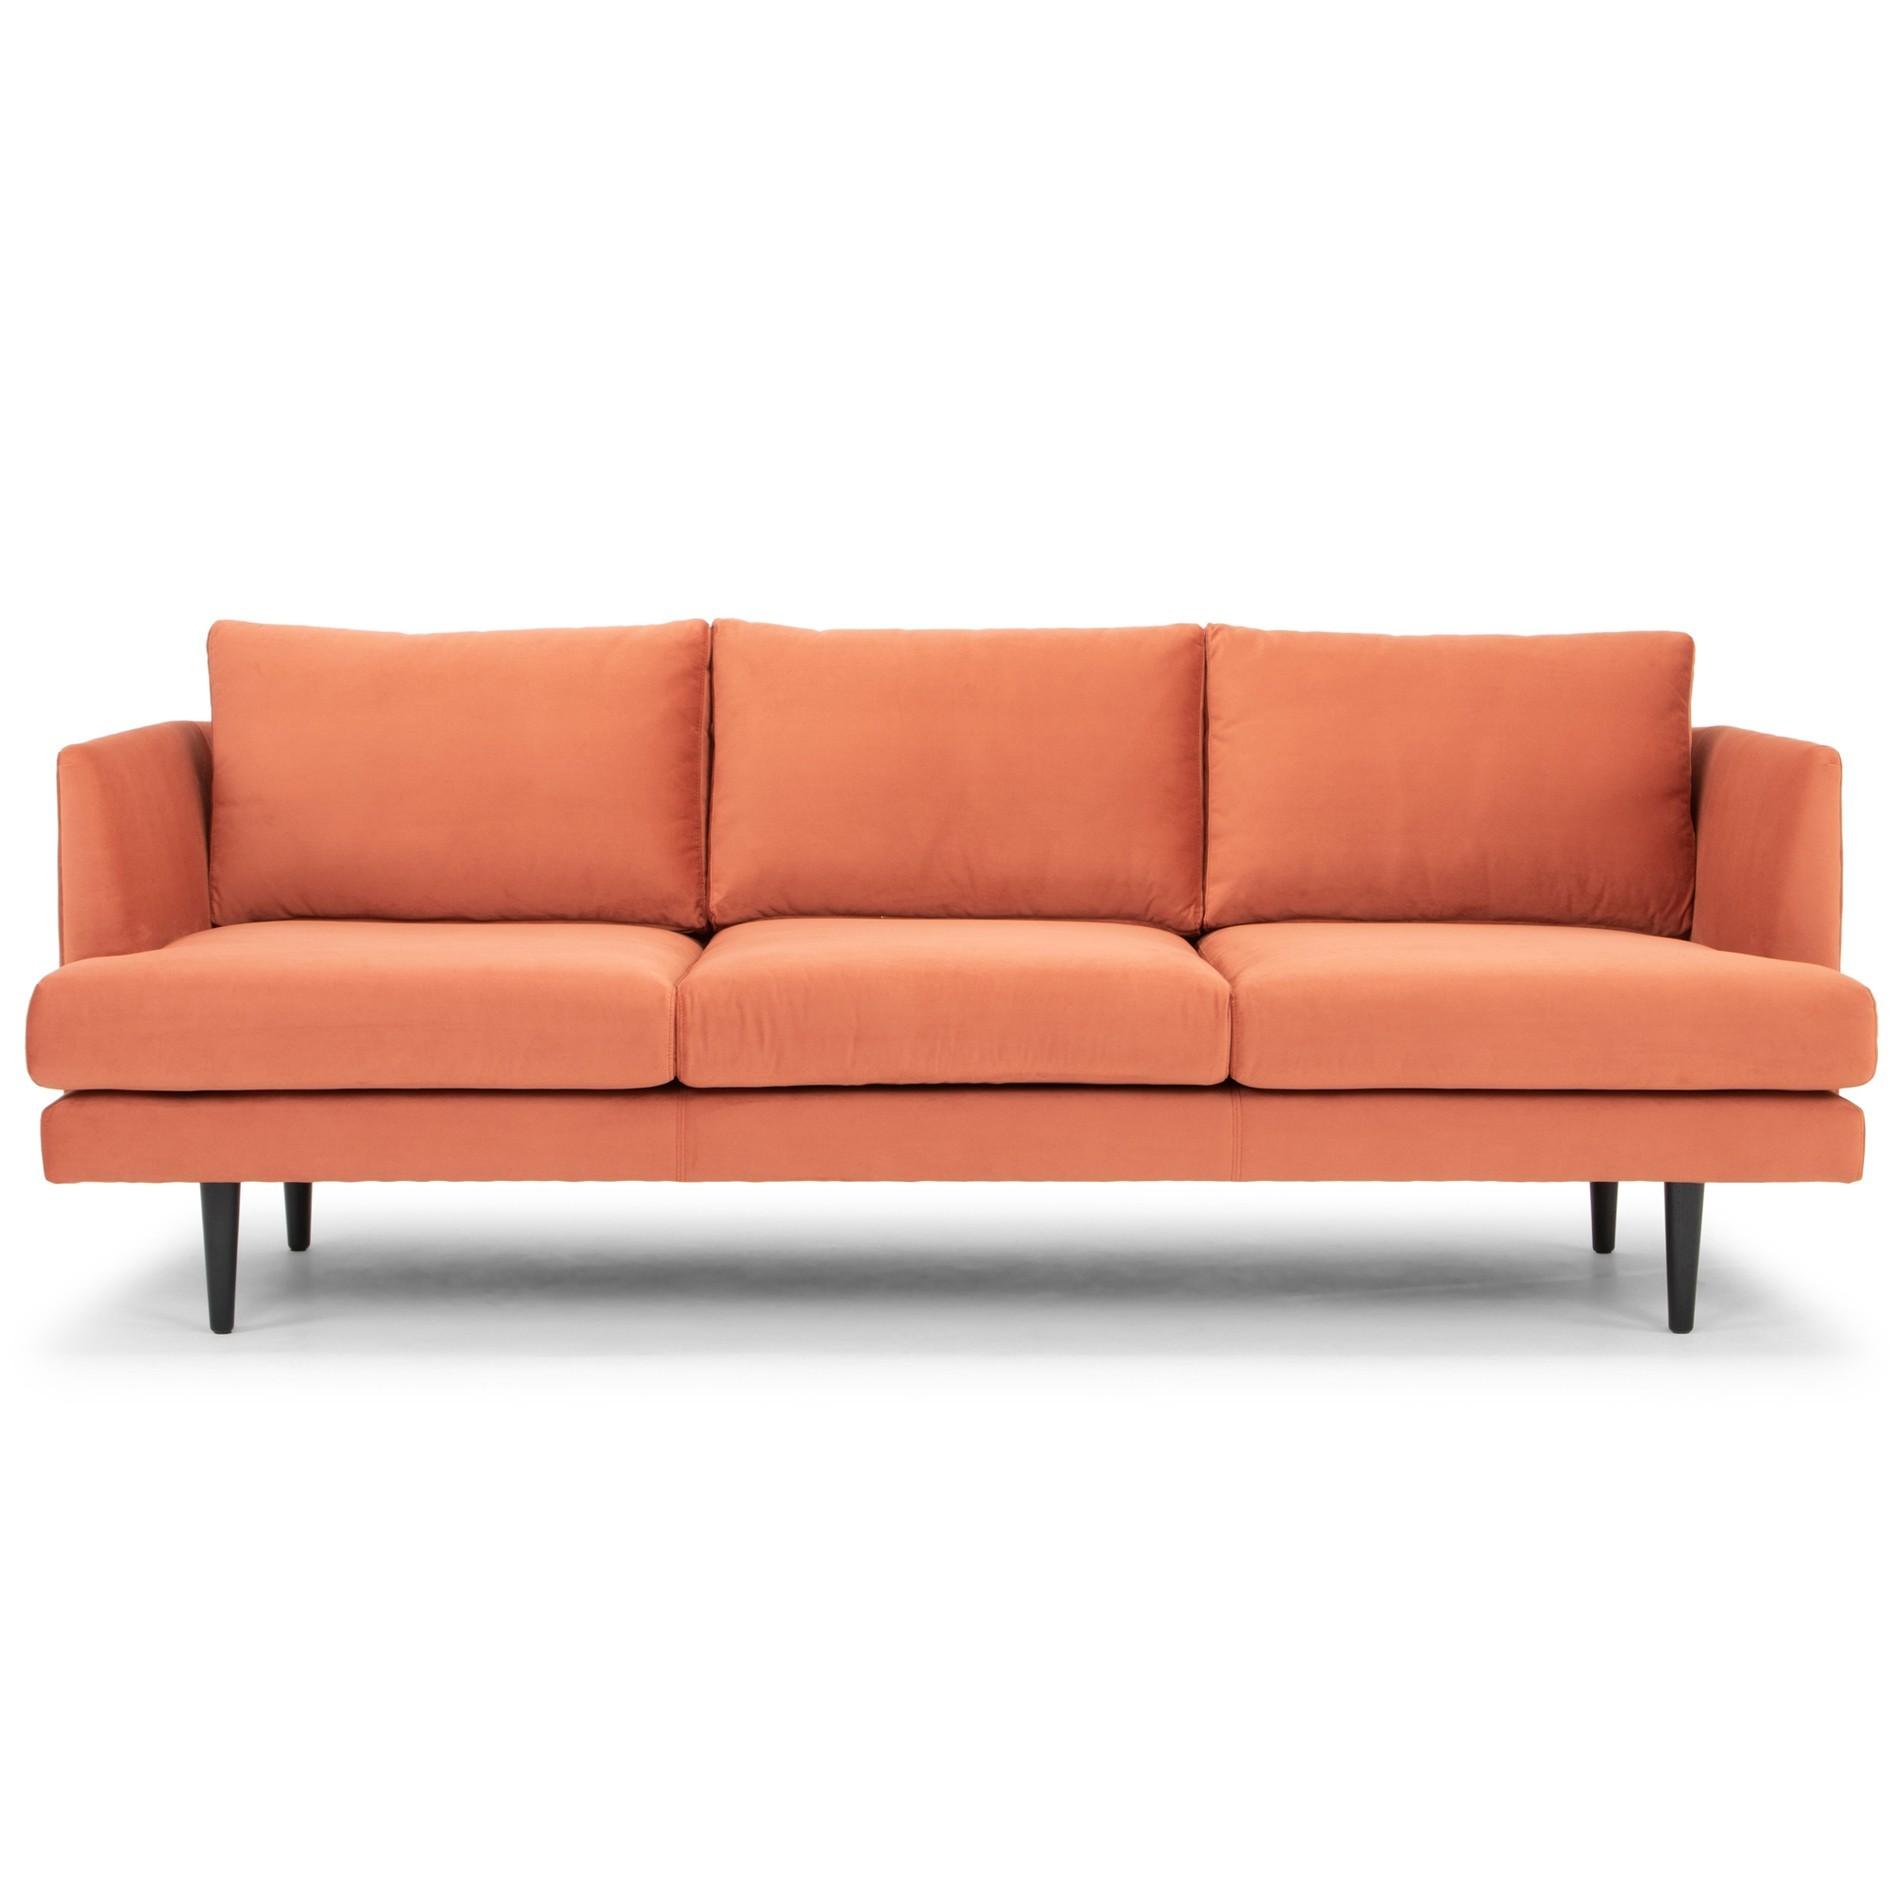 Mina Fabric Sofa, 3 Seater, Sunburnt Orange